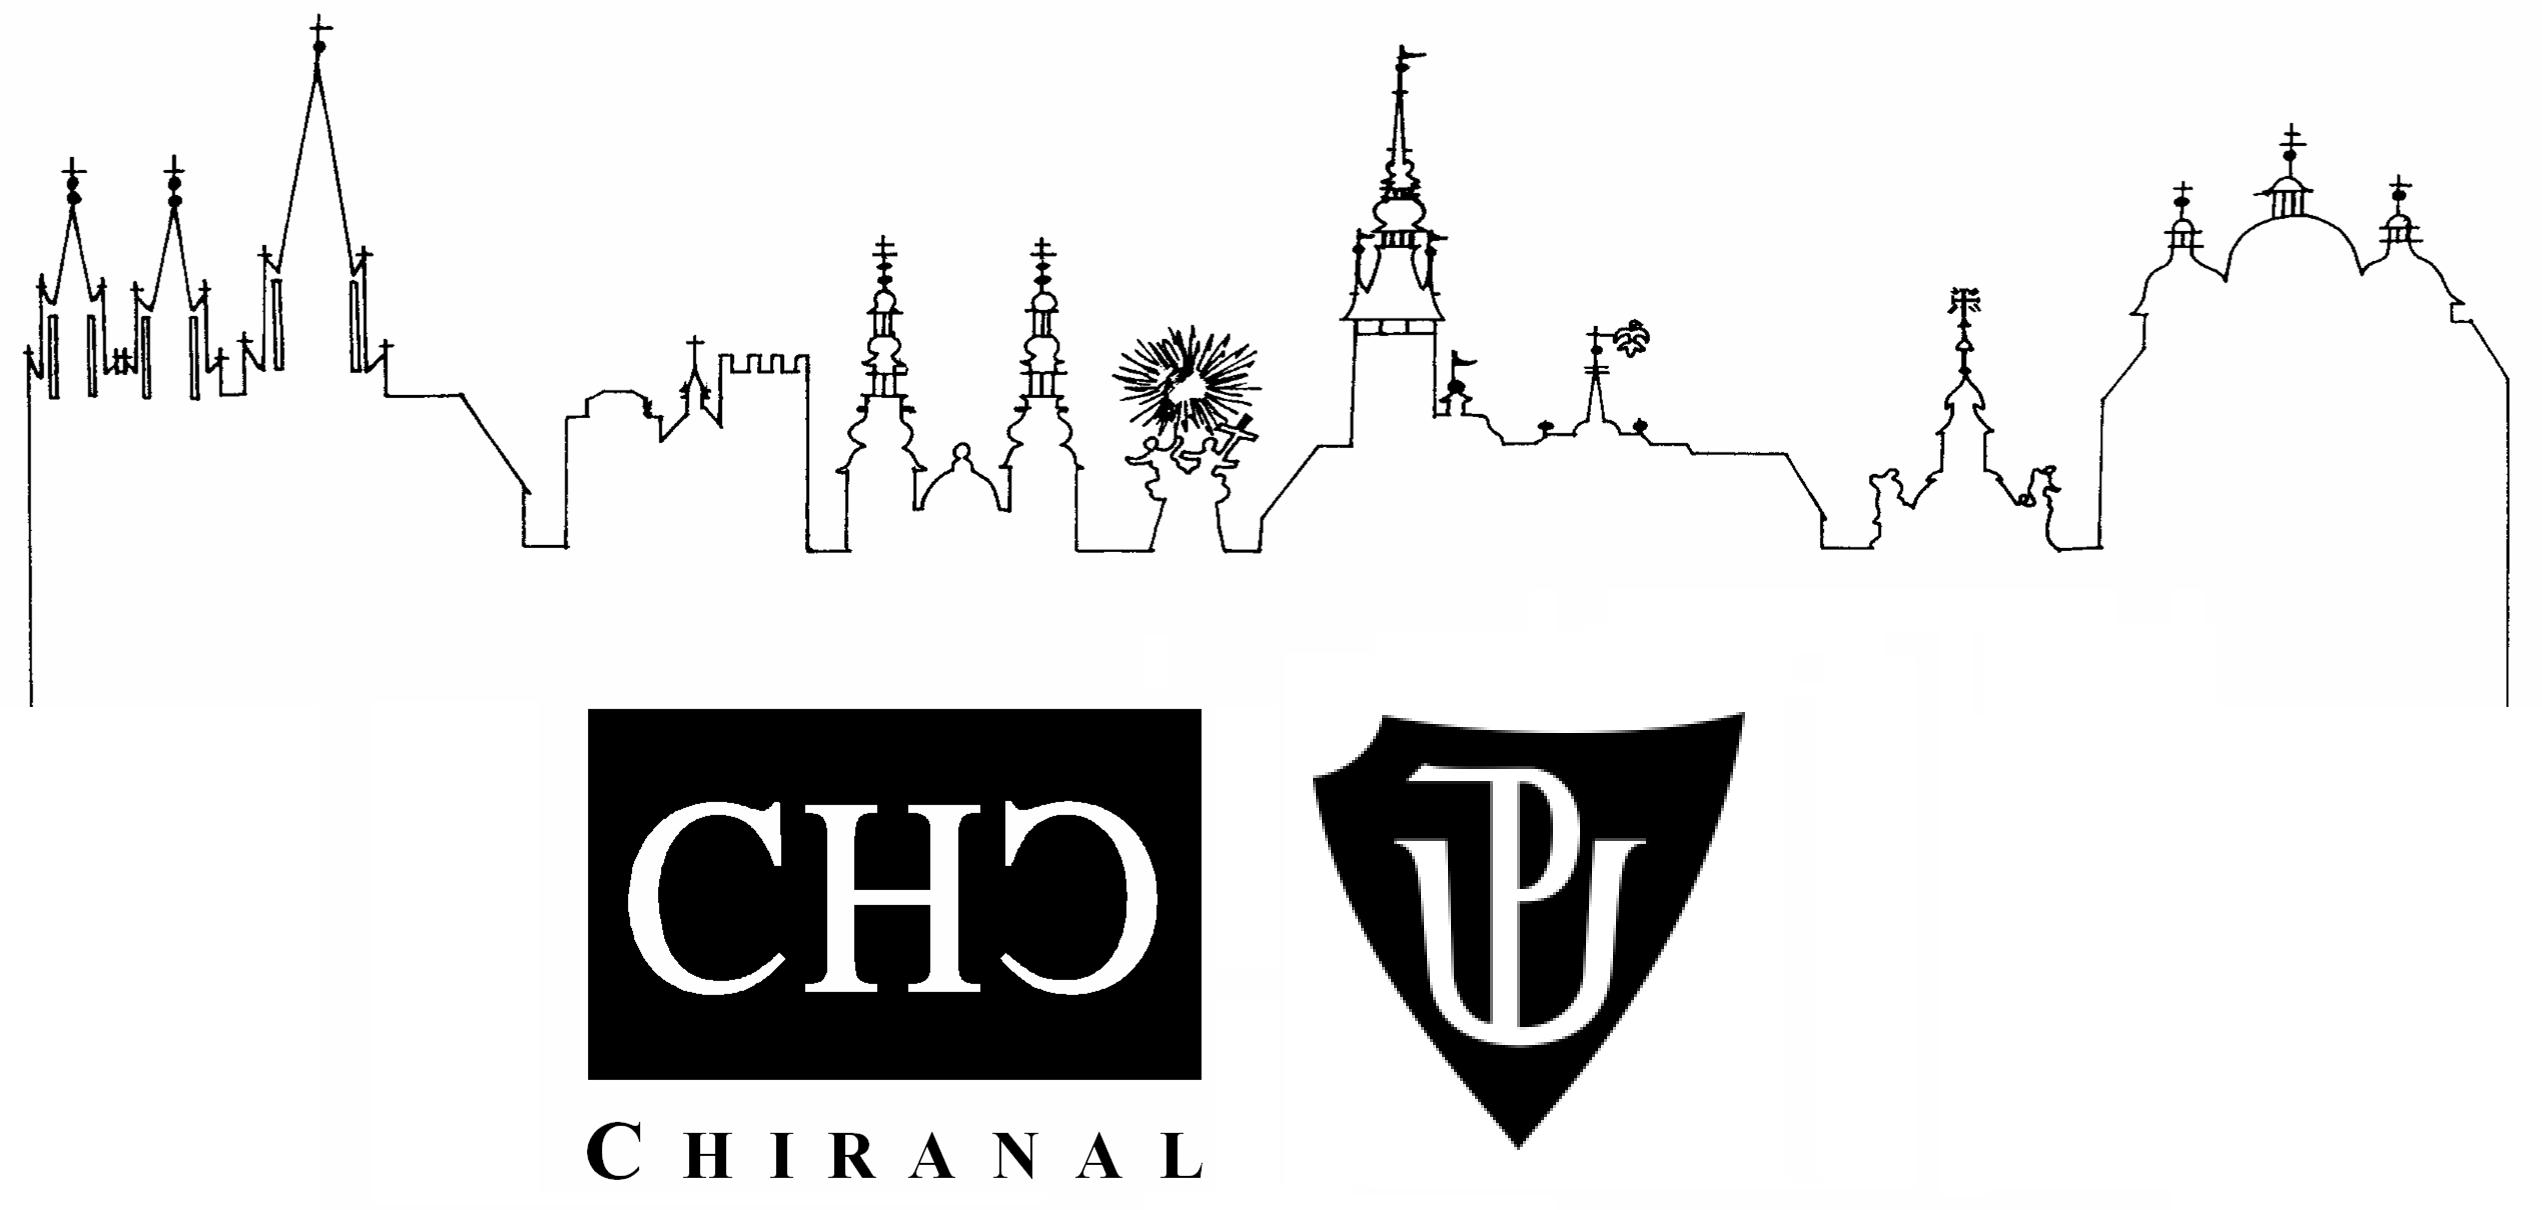 Univerzita Palackého v Olomouci: Chiranal 2020